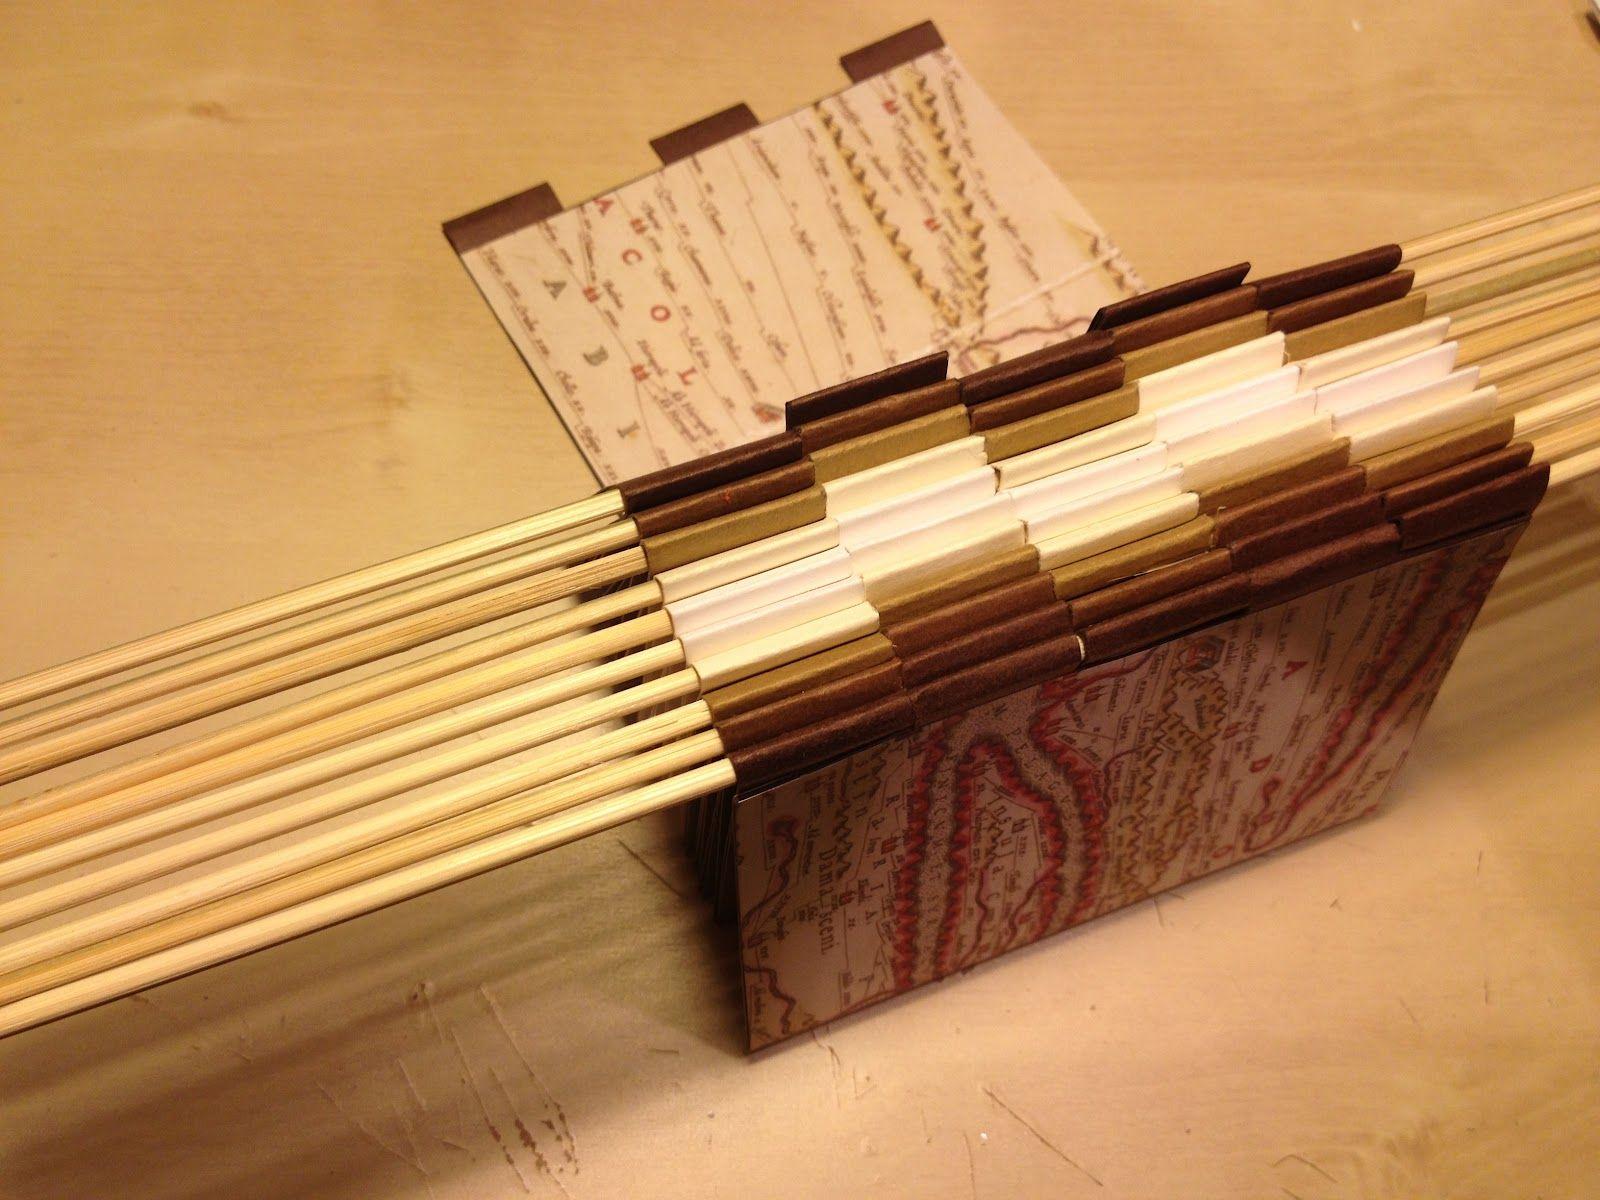 Bumbling Along How To Make A Piano Hinge Book Book Binding Methods Bookbinding Book Binding